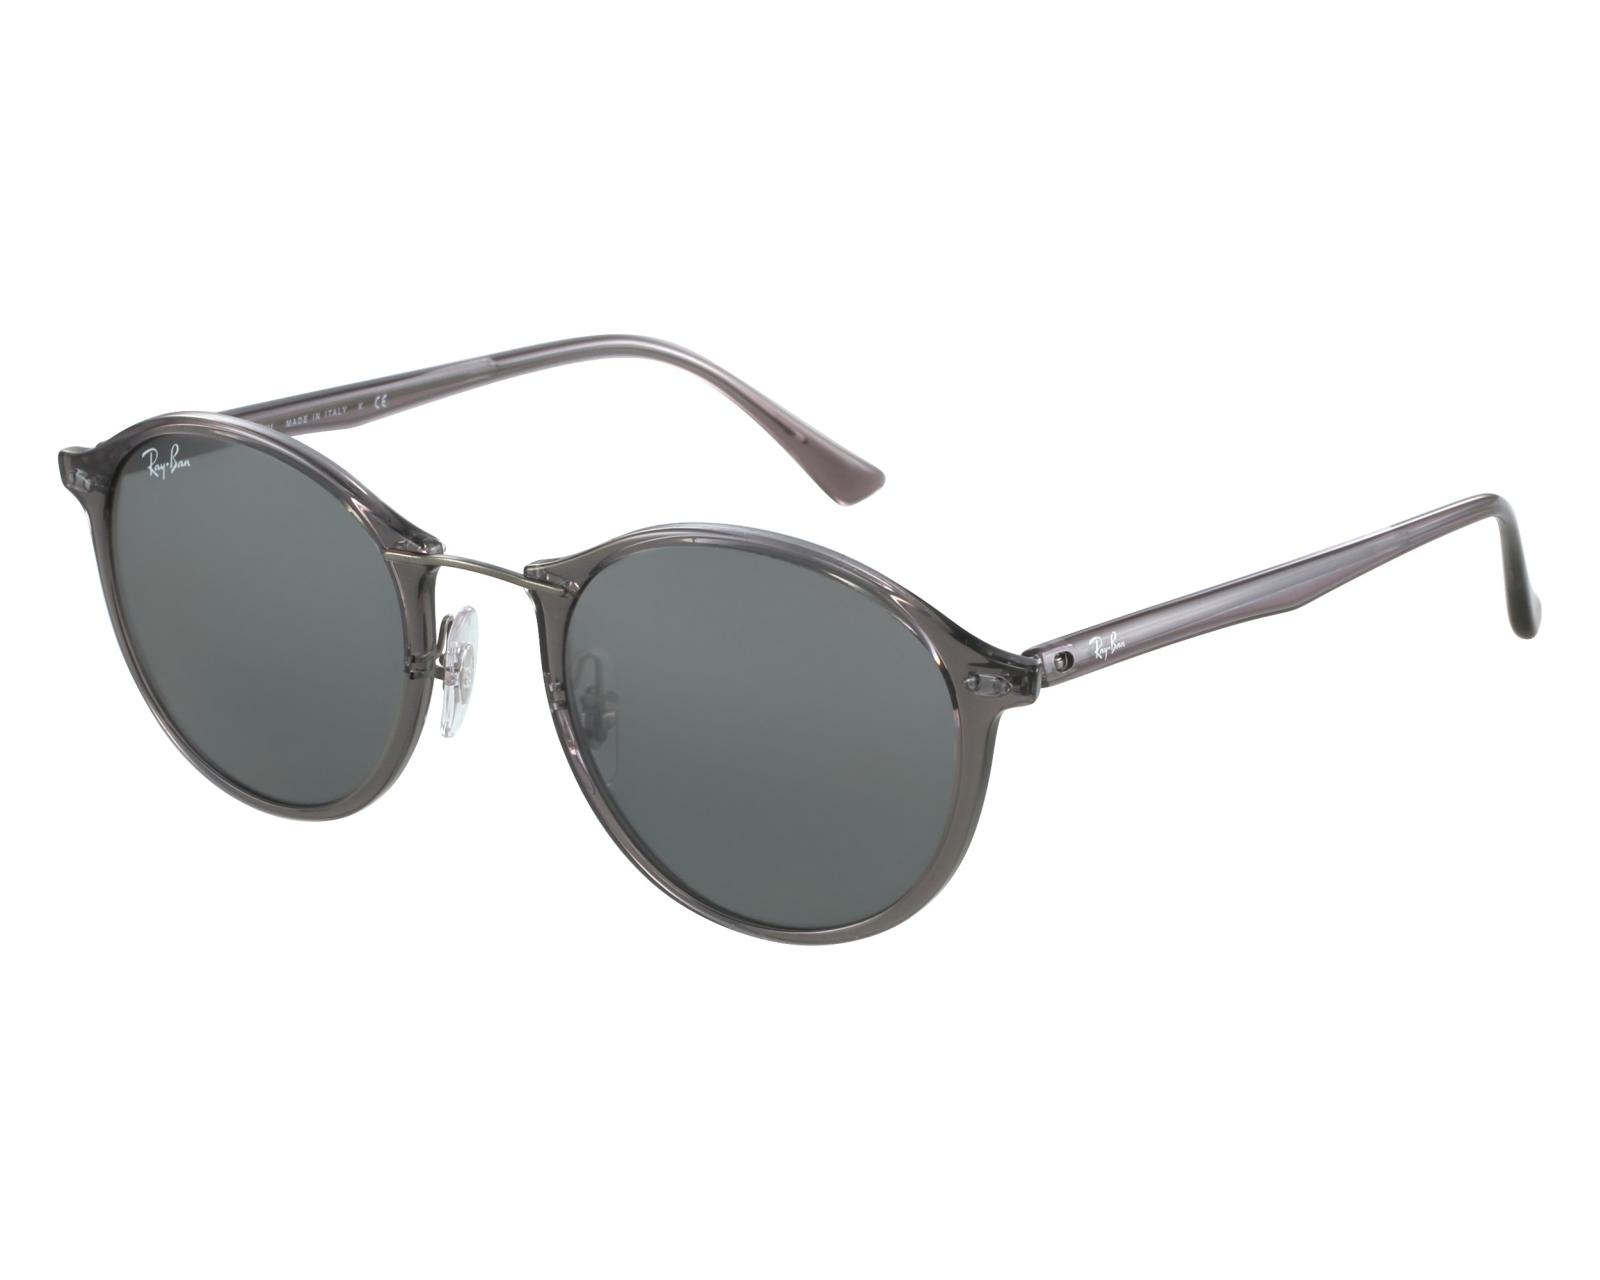 2600e64a4b thumbnail Sunglasses Ray-Ban RB-4242 6200 88 - Grey front view